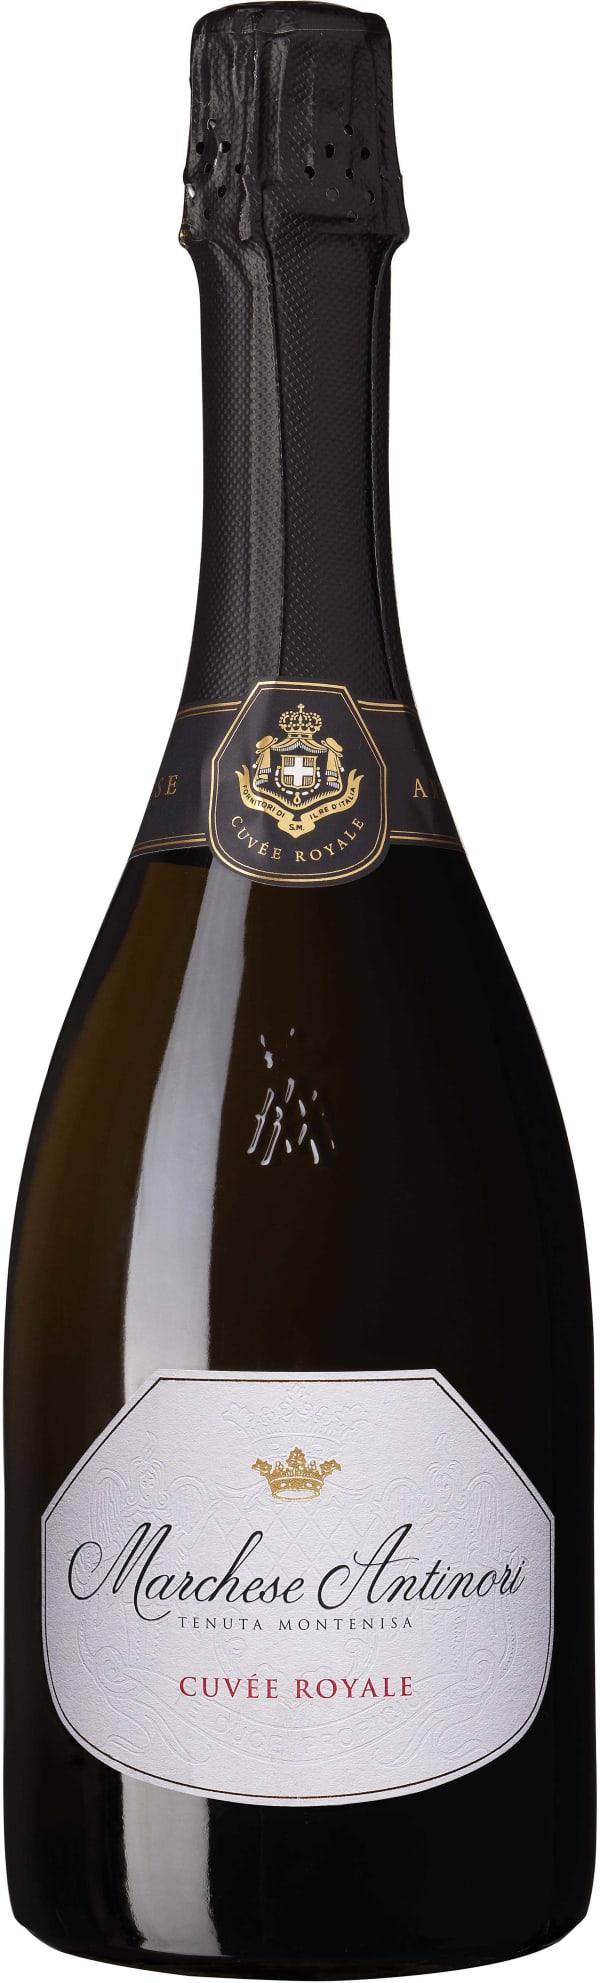 Marchese Antinori Cuvée Royale Brut